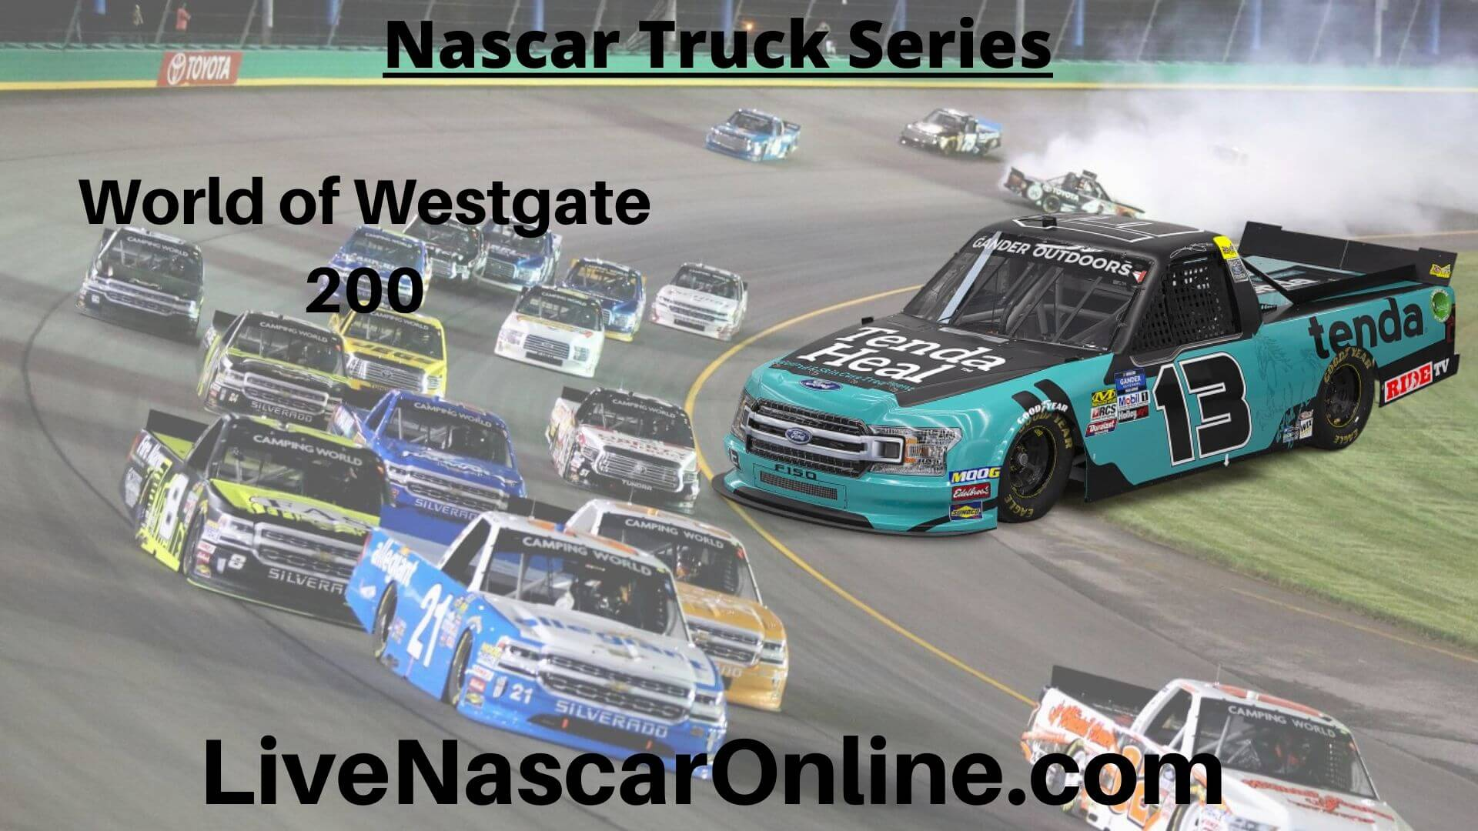 World of Westgate 200 Online Stream | NASCAR Las Vegas 2020